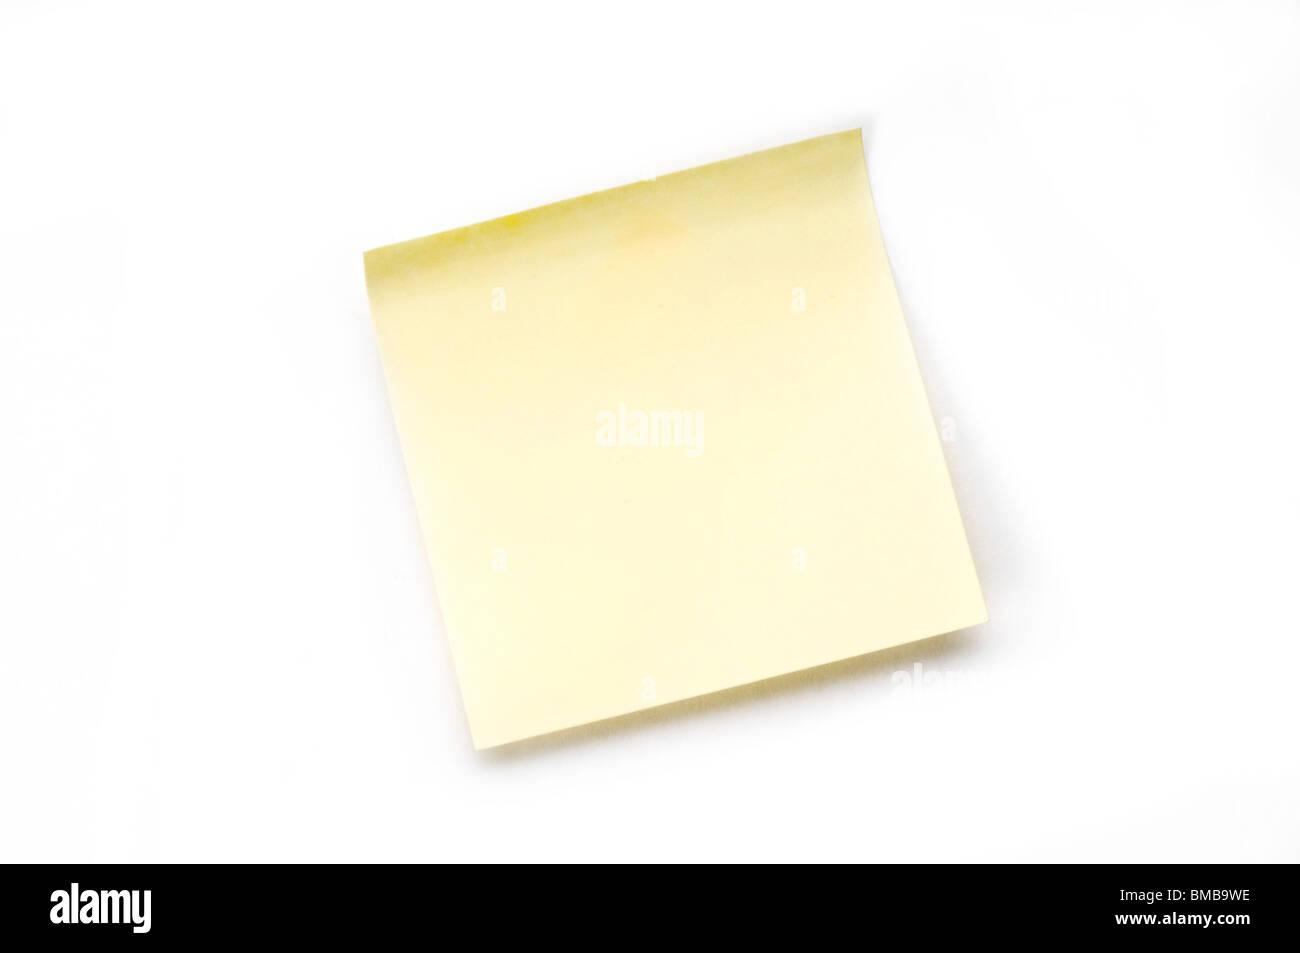 Nota adesiva su bianco Immagini Stock